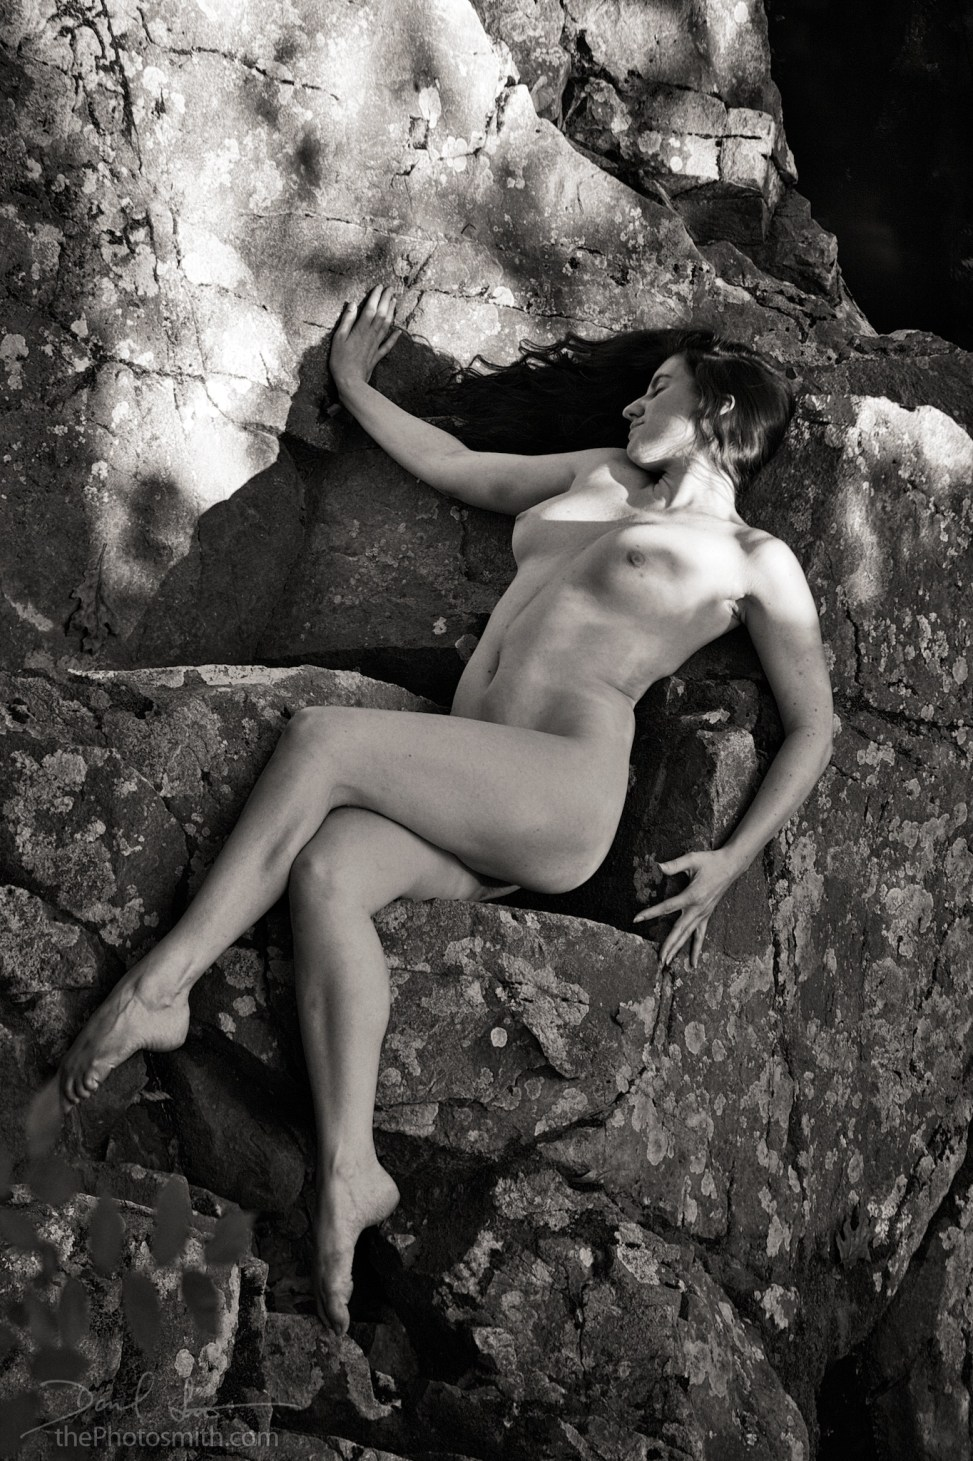 defiant - Katy T by the Photosmith